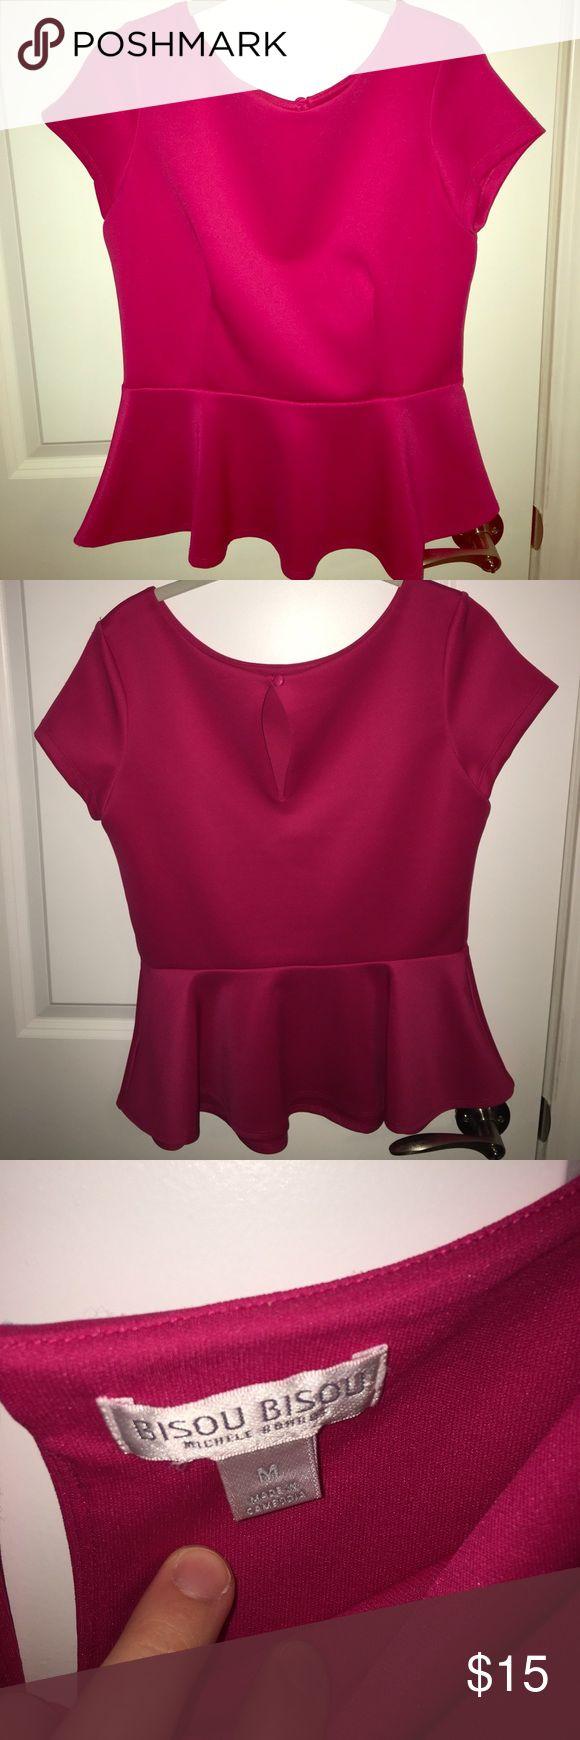 Pink Peplum Dress Shirt Gently used Women's peplum dress shirt. Size M. Bisou Bisou Tops Blouses